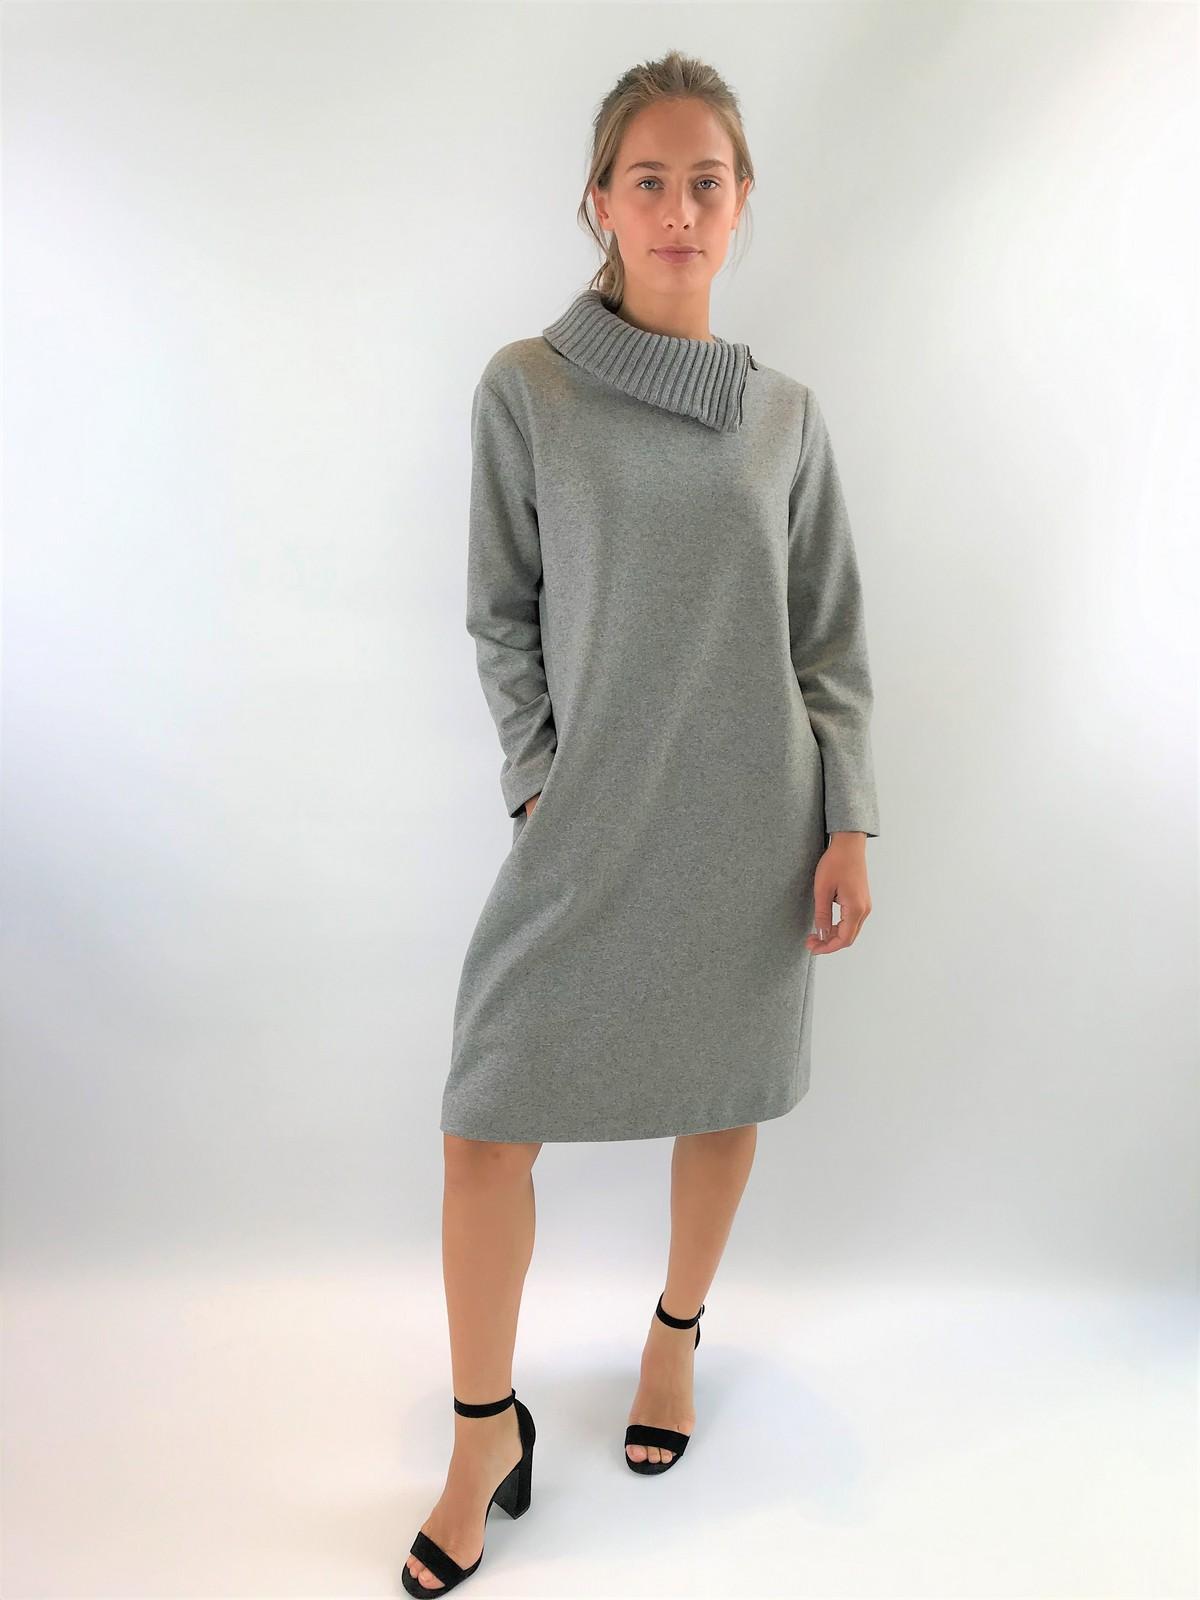 Antonelli Firenze - Mondrian - Kleed tricot